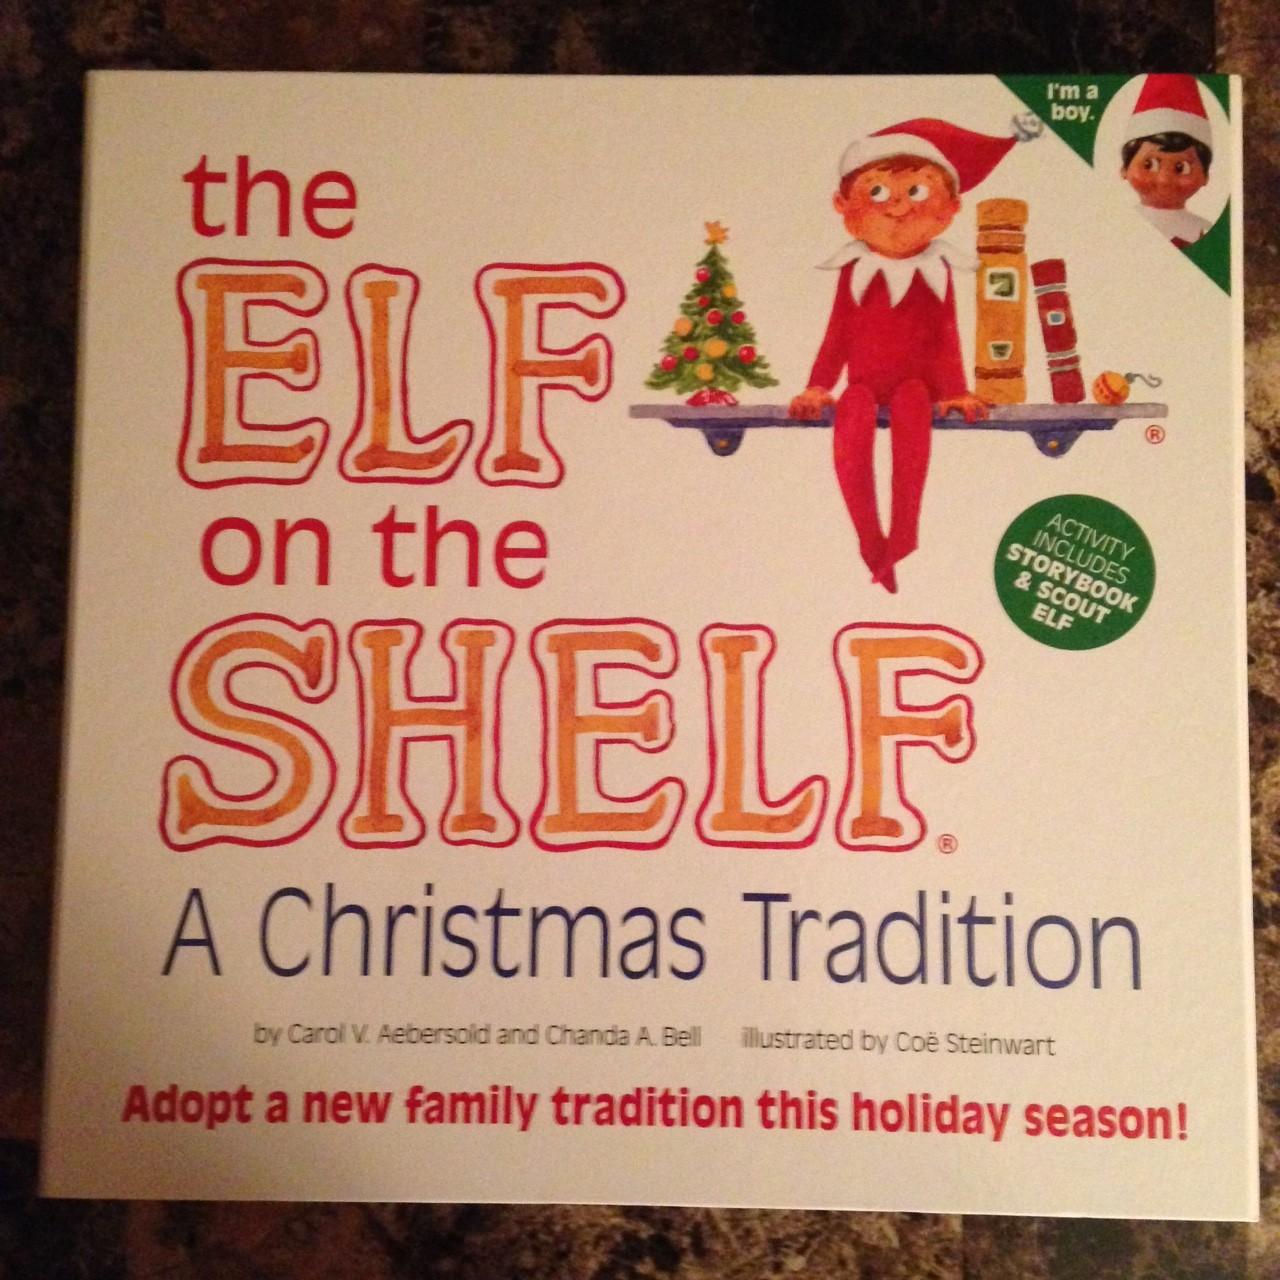 The Elf On A Shelf: A Christmas Tradition